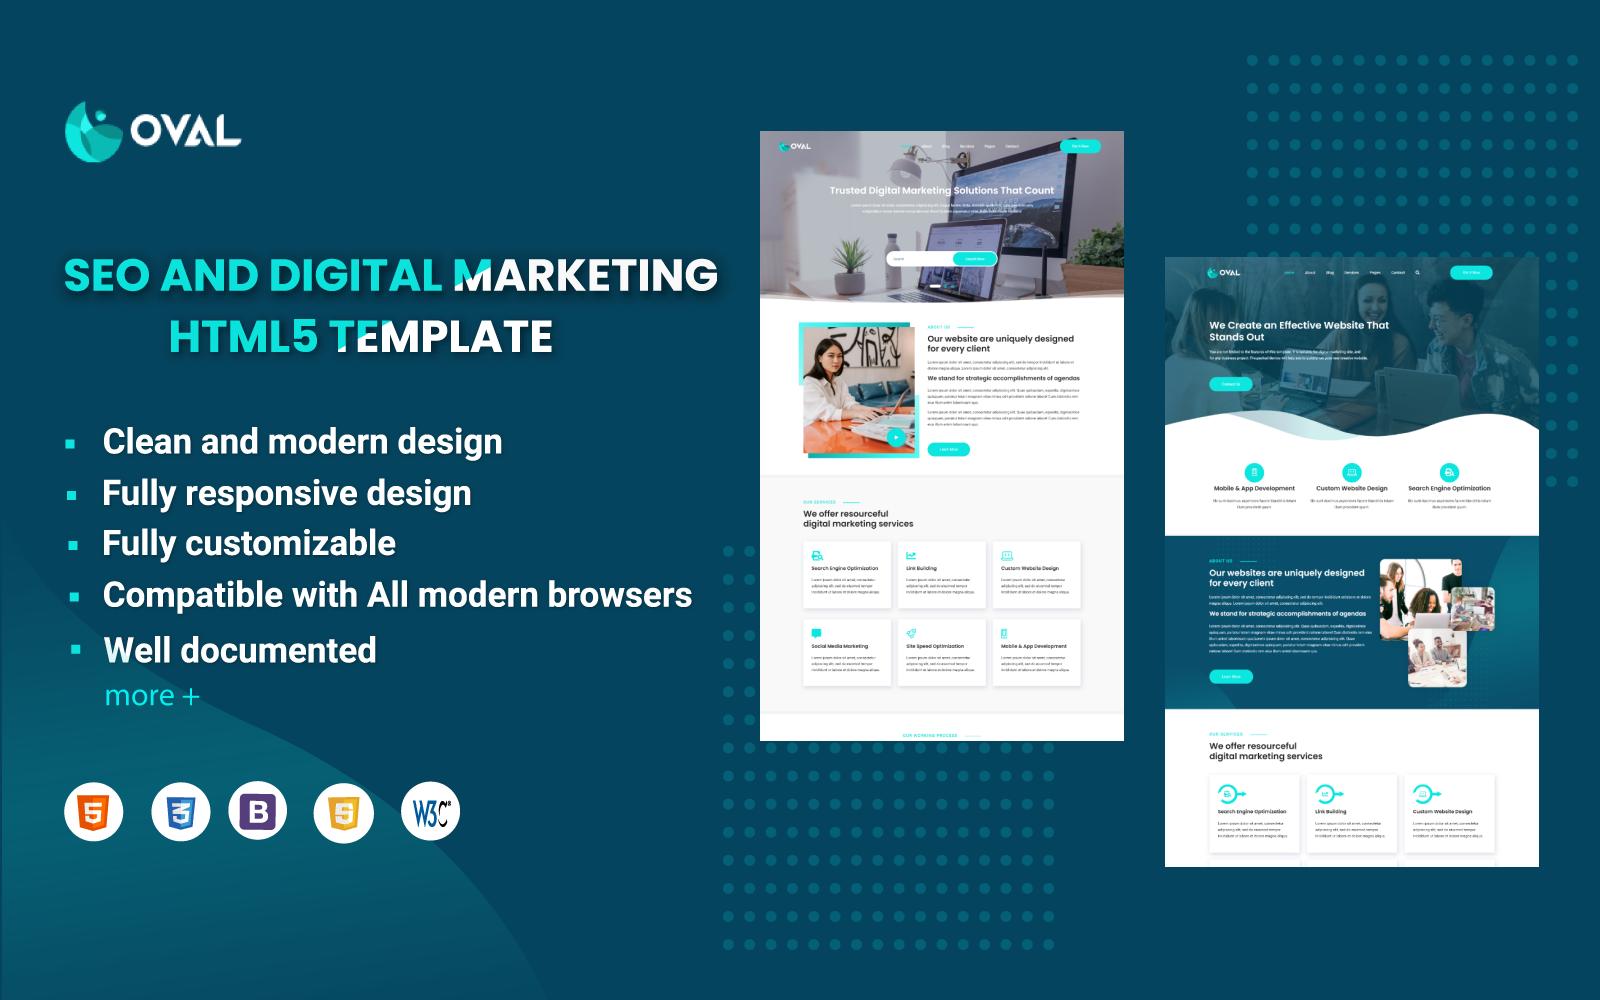 Oval - SEO and Digital Marketing HTML5 Template